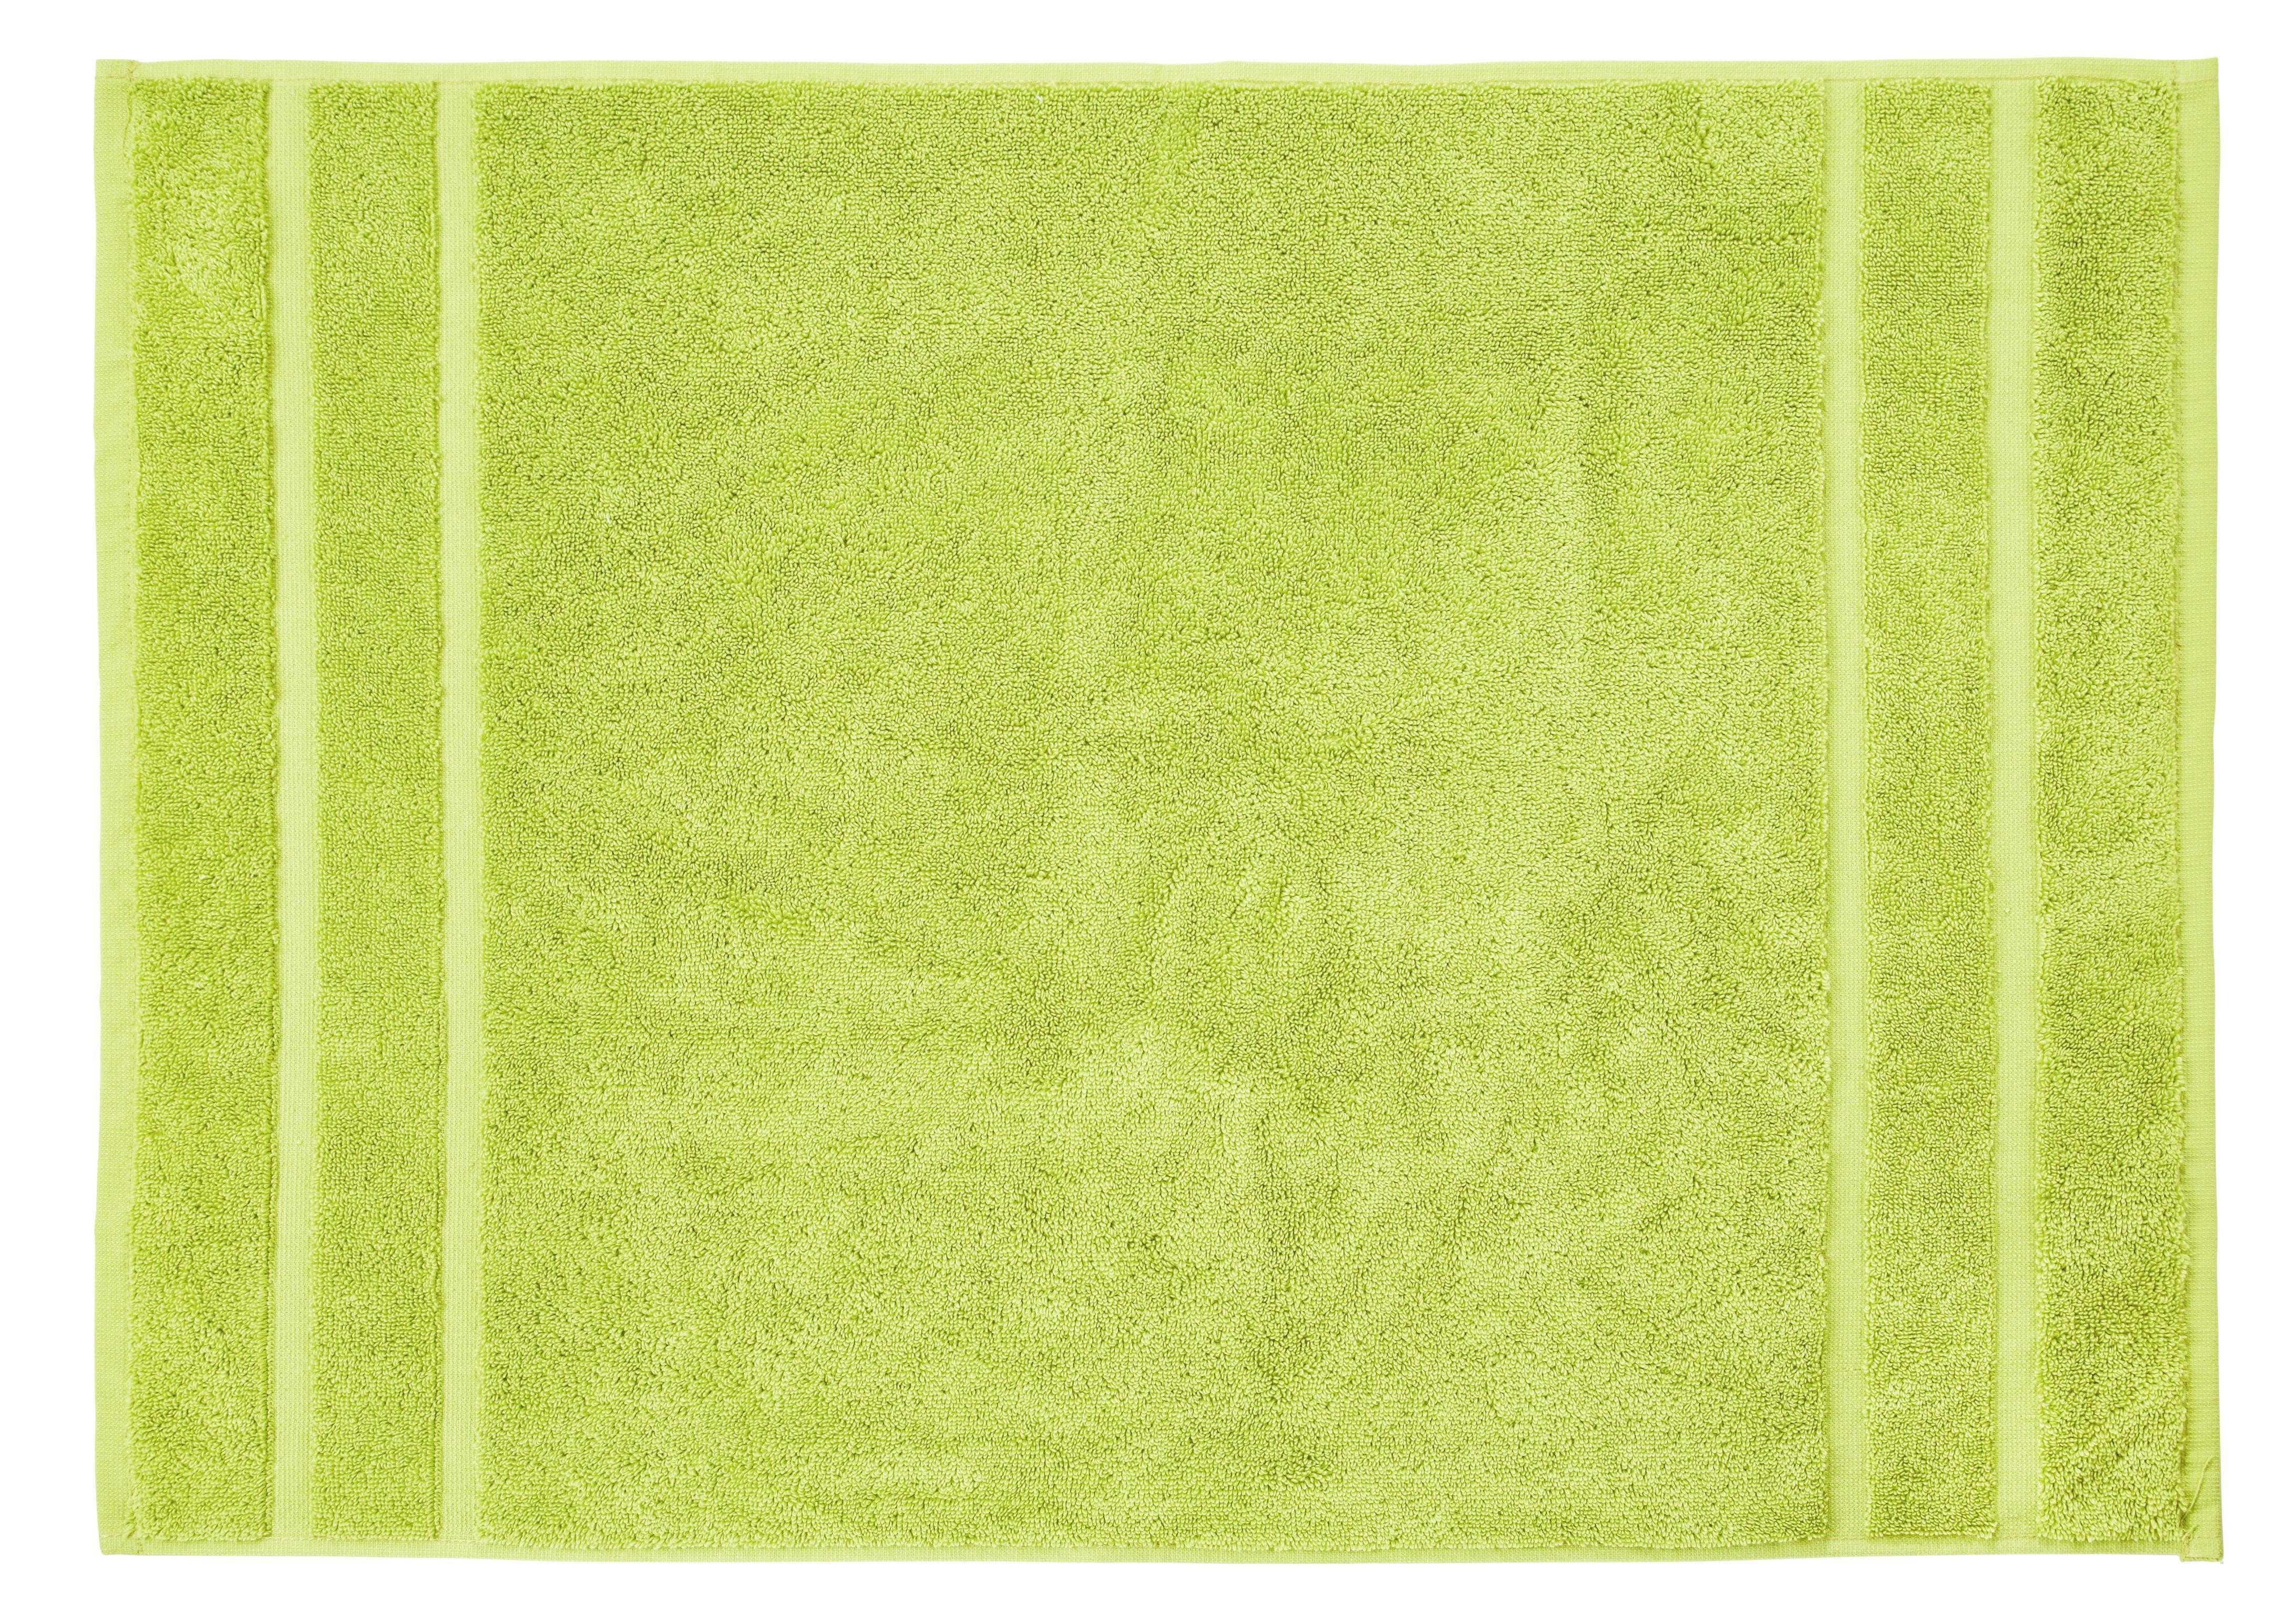 Badematte Melanie ca. 50x70cm - Grün, Textil (50/70cm) - MÖMAX modern living